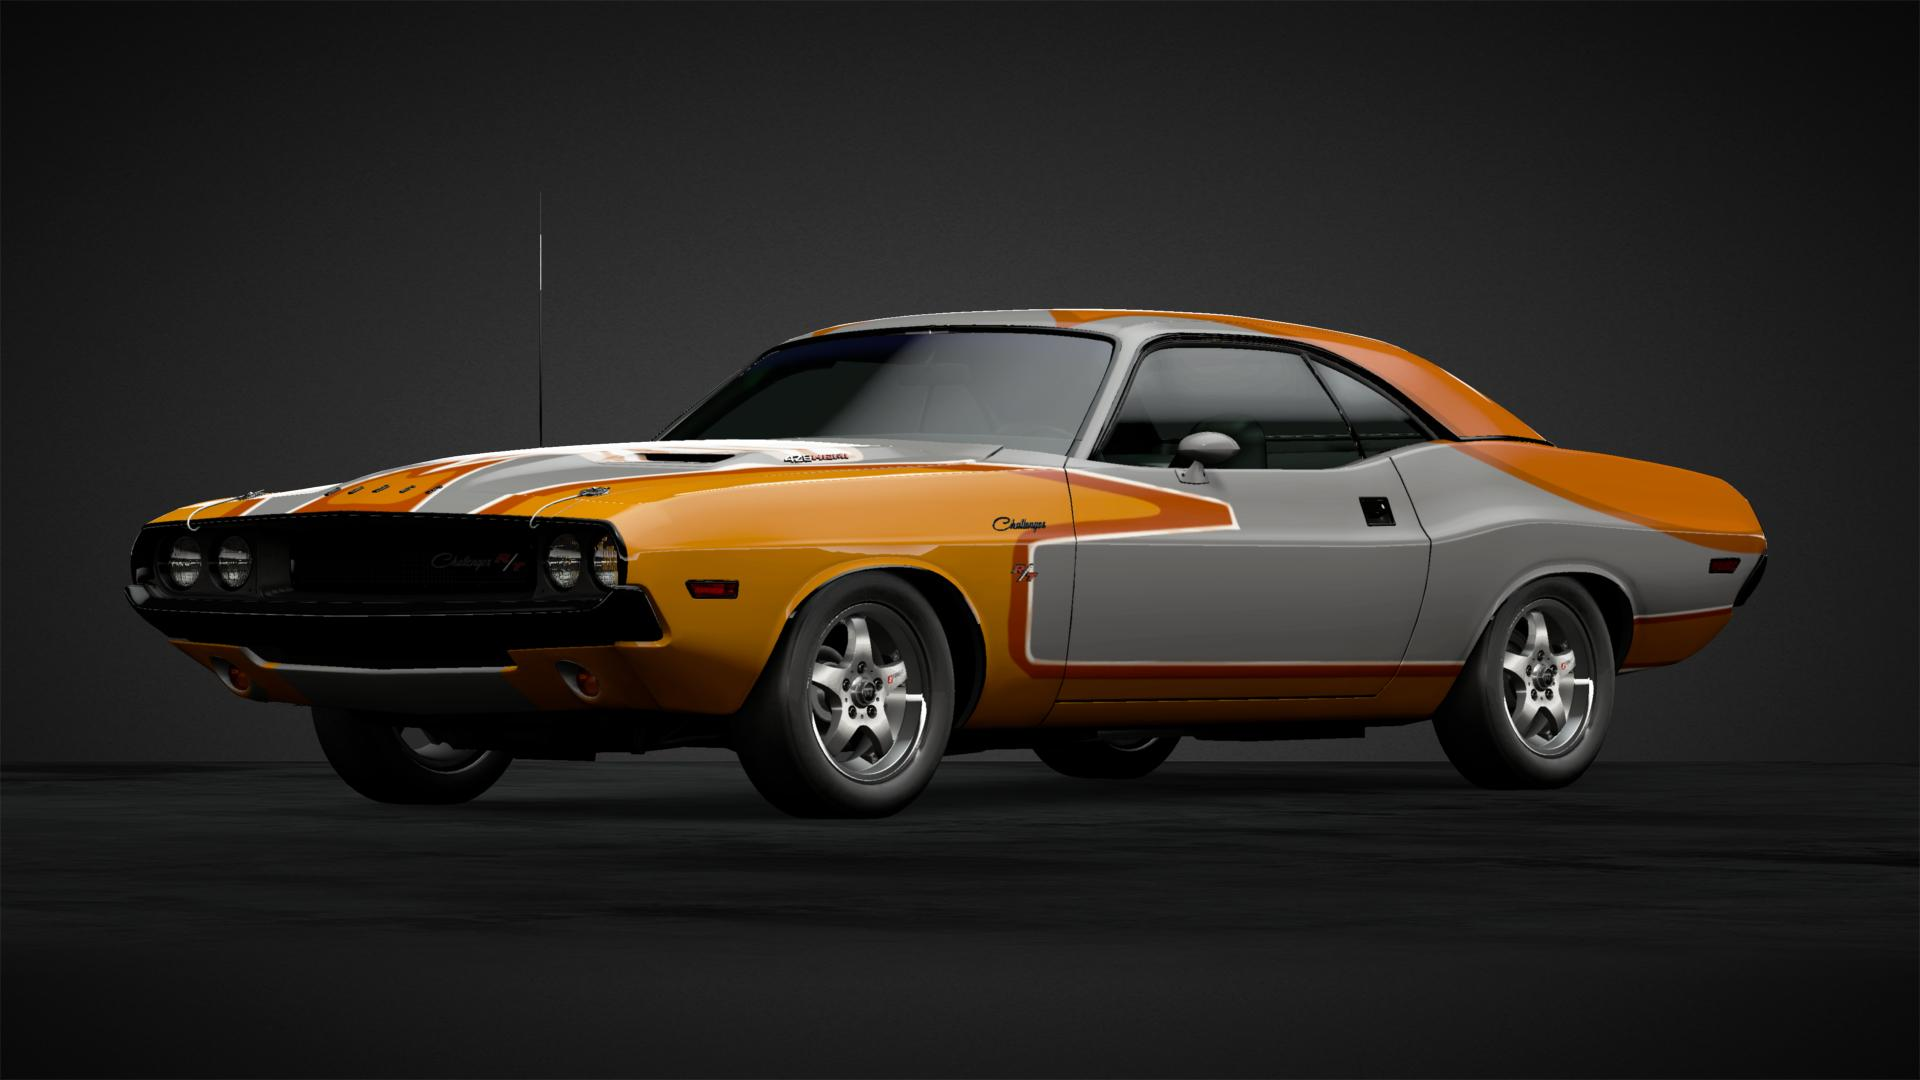 Nfs Carbon Dodge Angie Car Livery By El Diego Xd Community Gran Turismo Sport